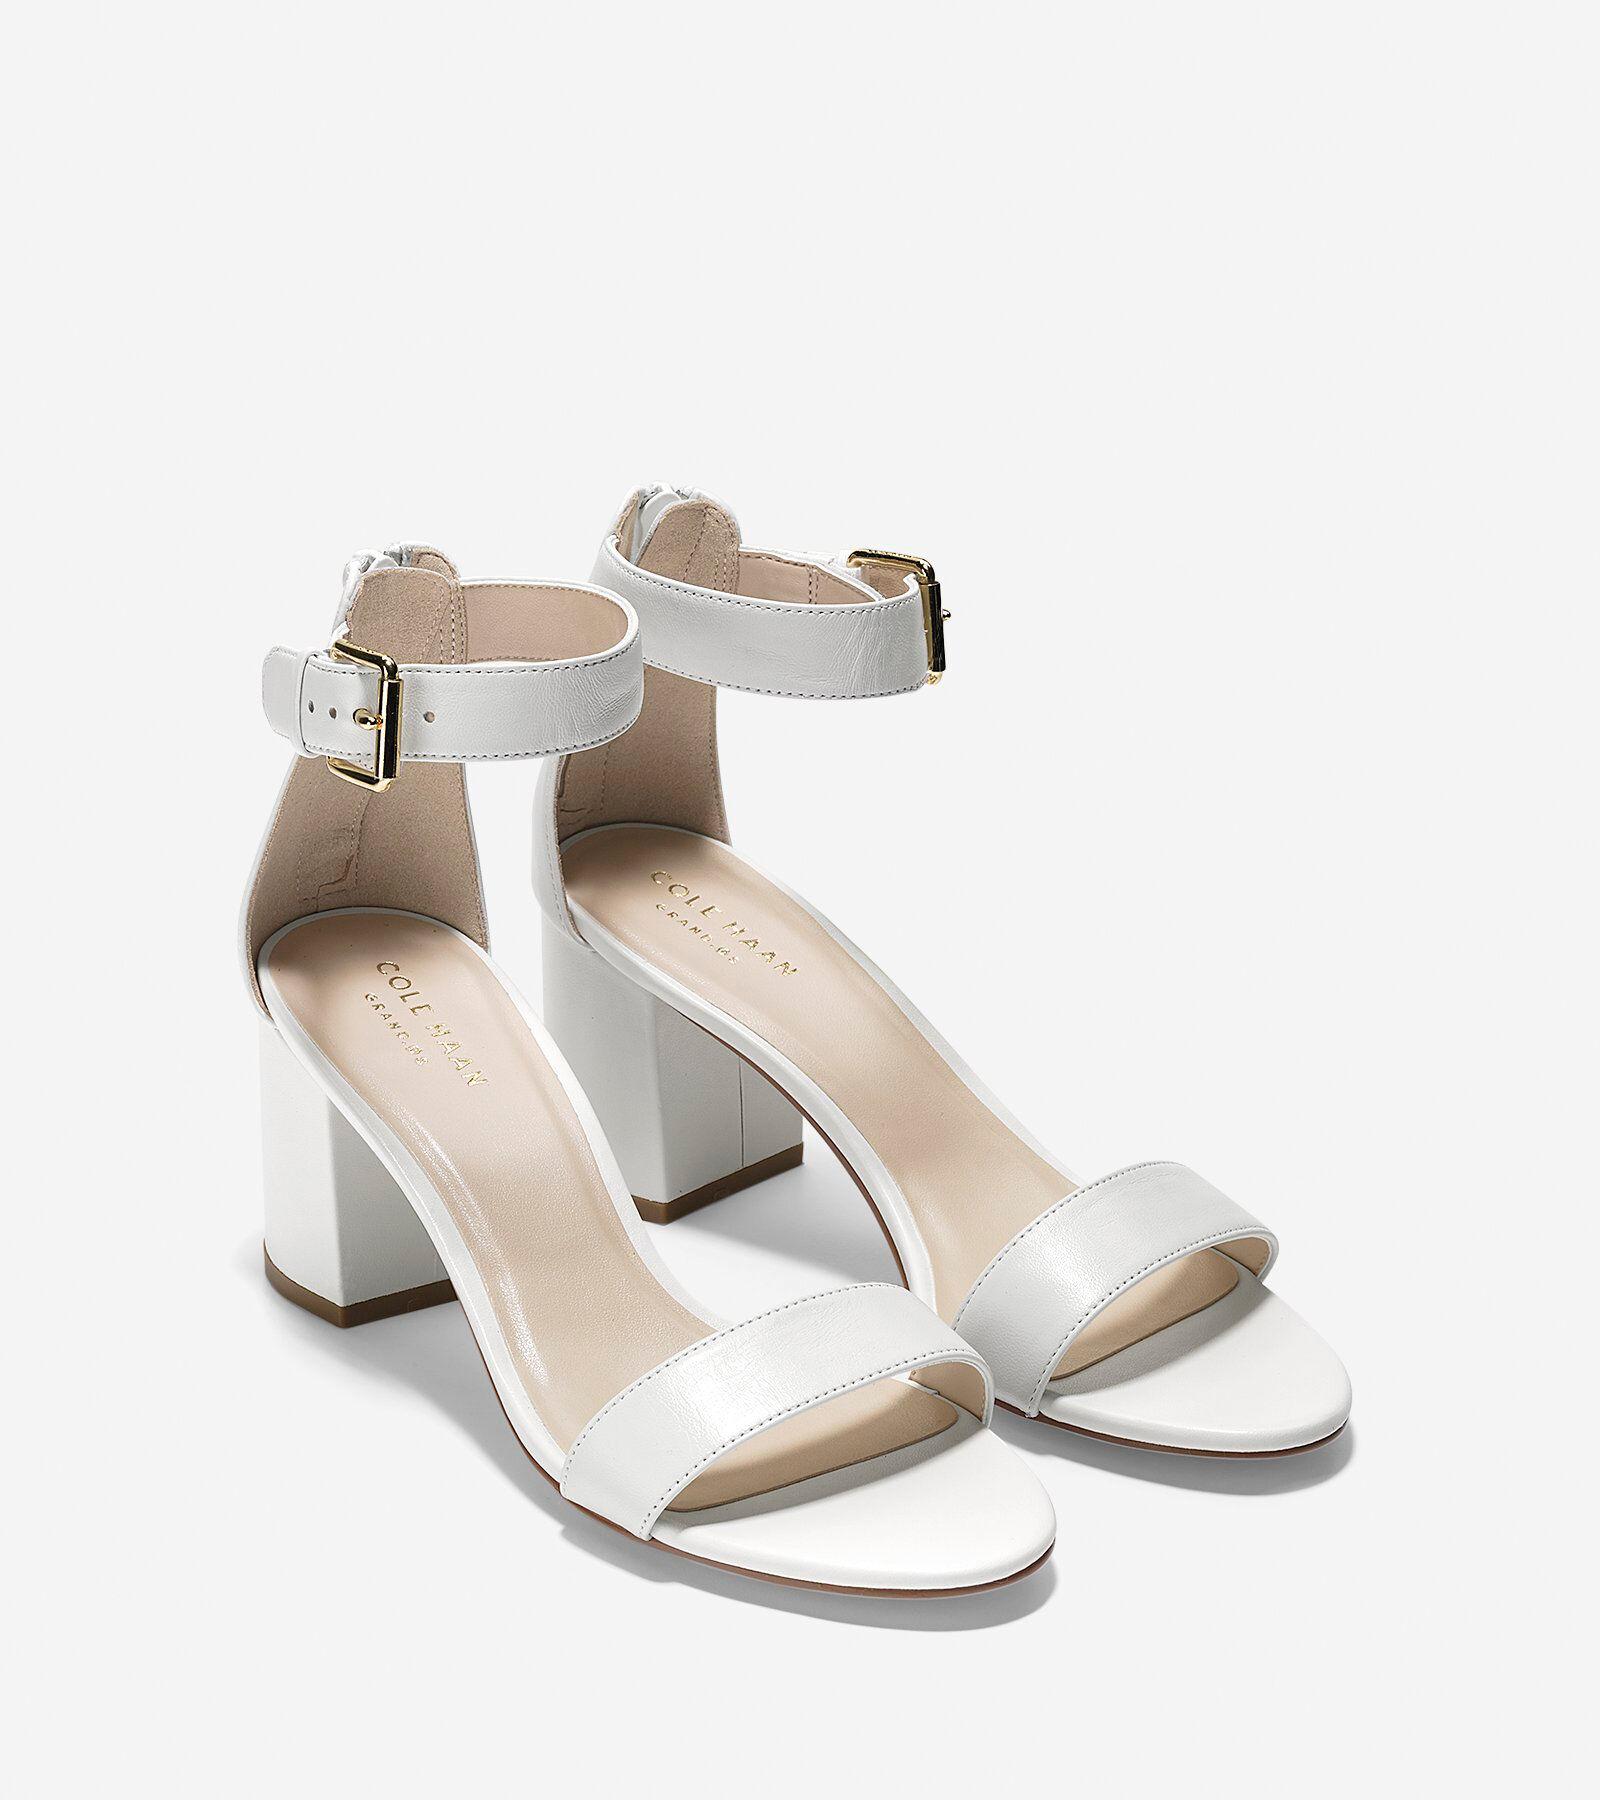 Cole Haan Women's Clarette Sandal cheap purchase NITC6J